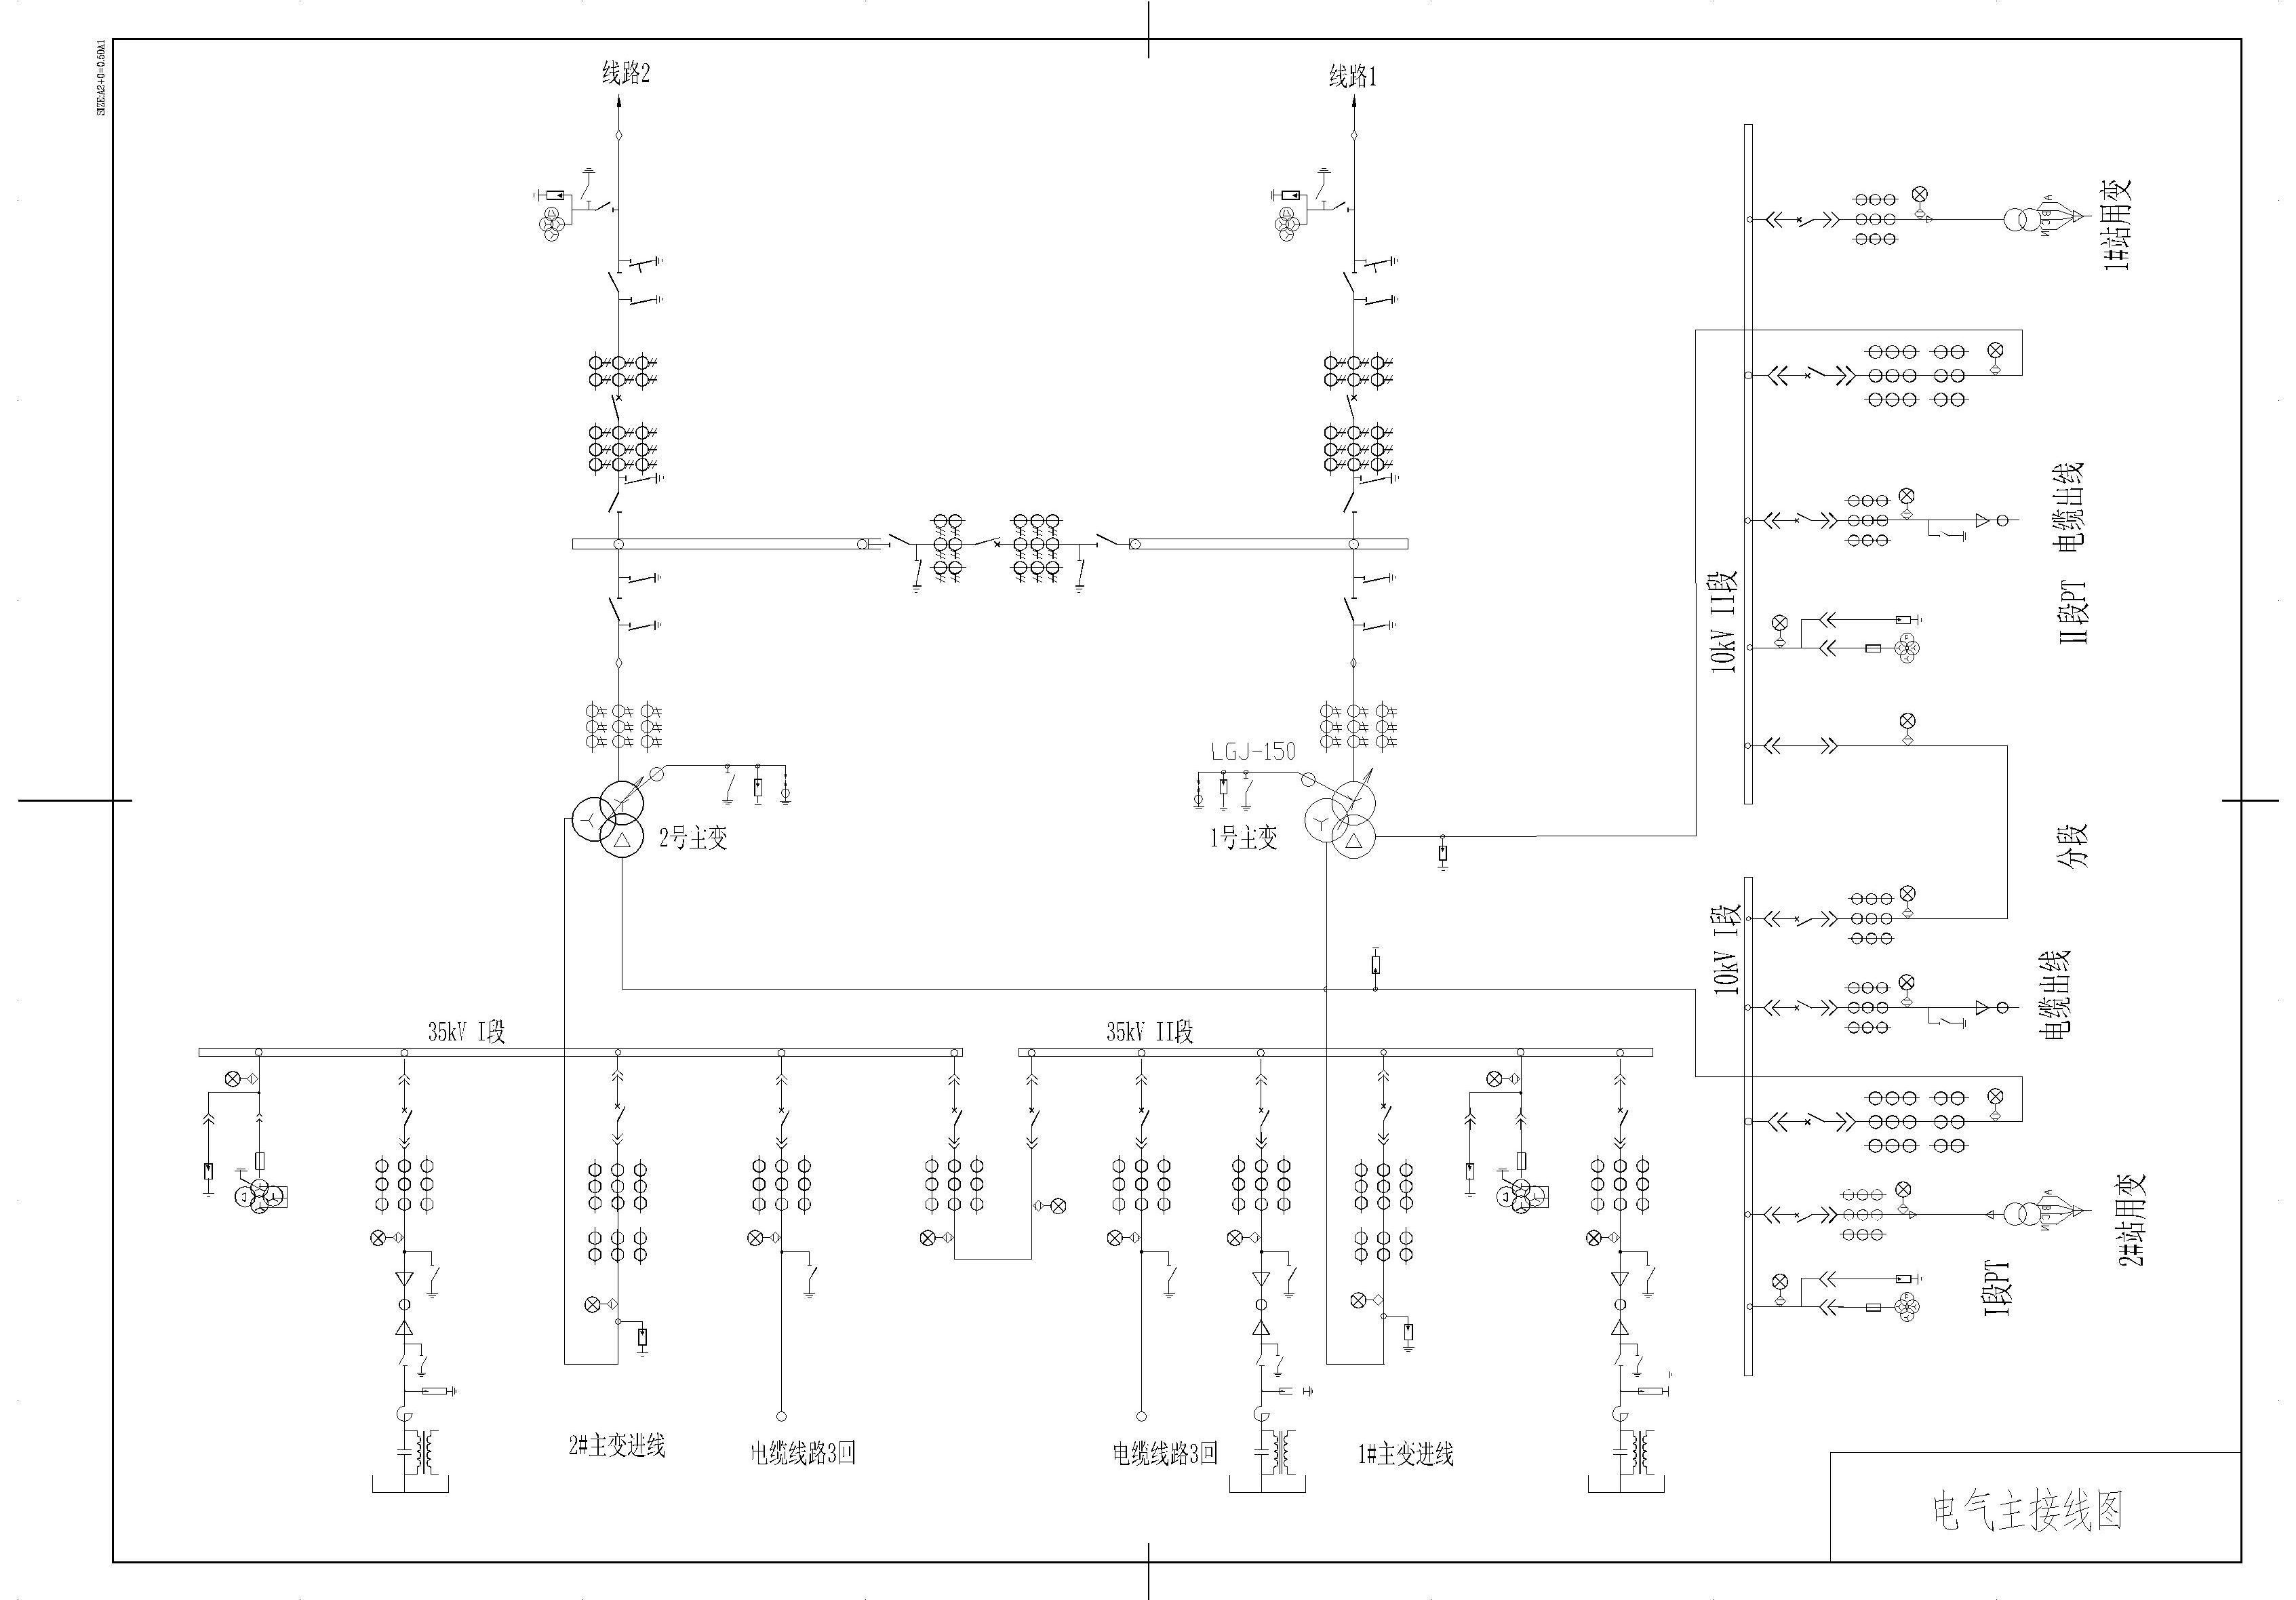 35kv变电所主接线图_110kV变电站电气主接线简图_百度知道